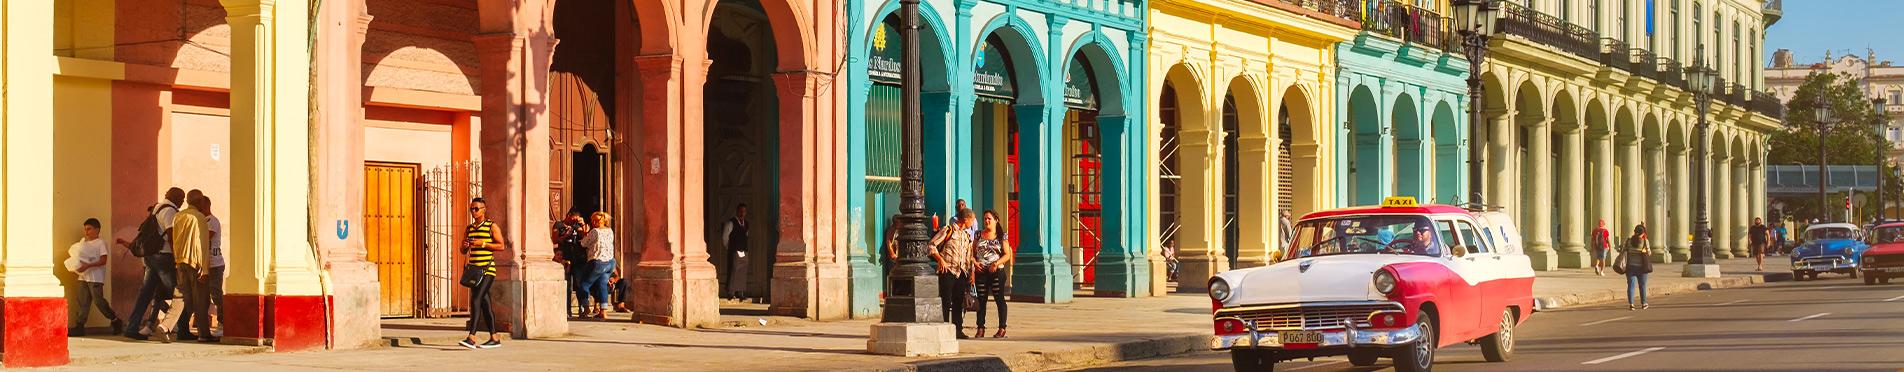 Colourful buildings in Havana Cuba